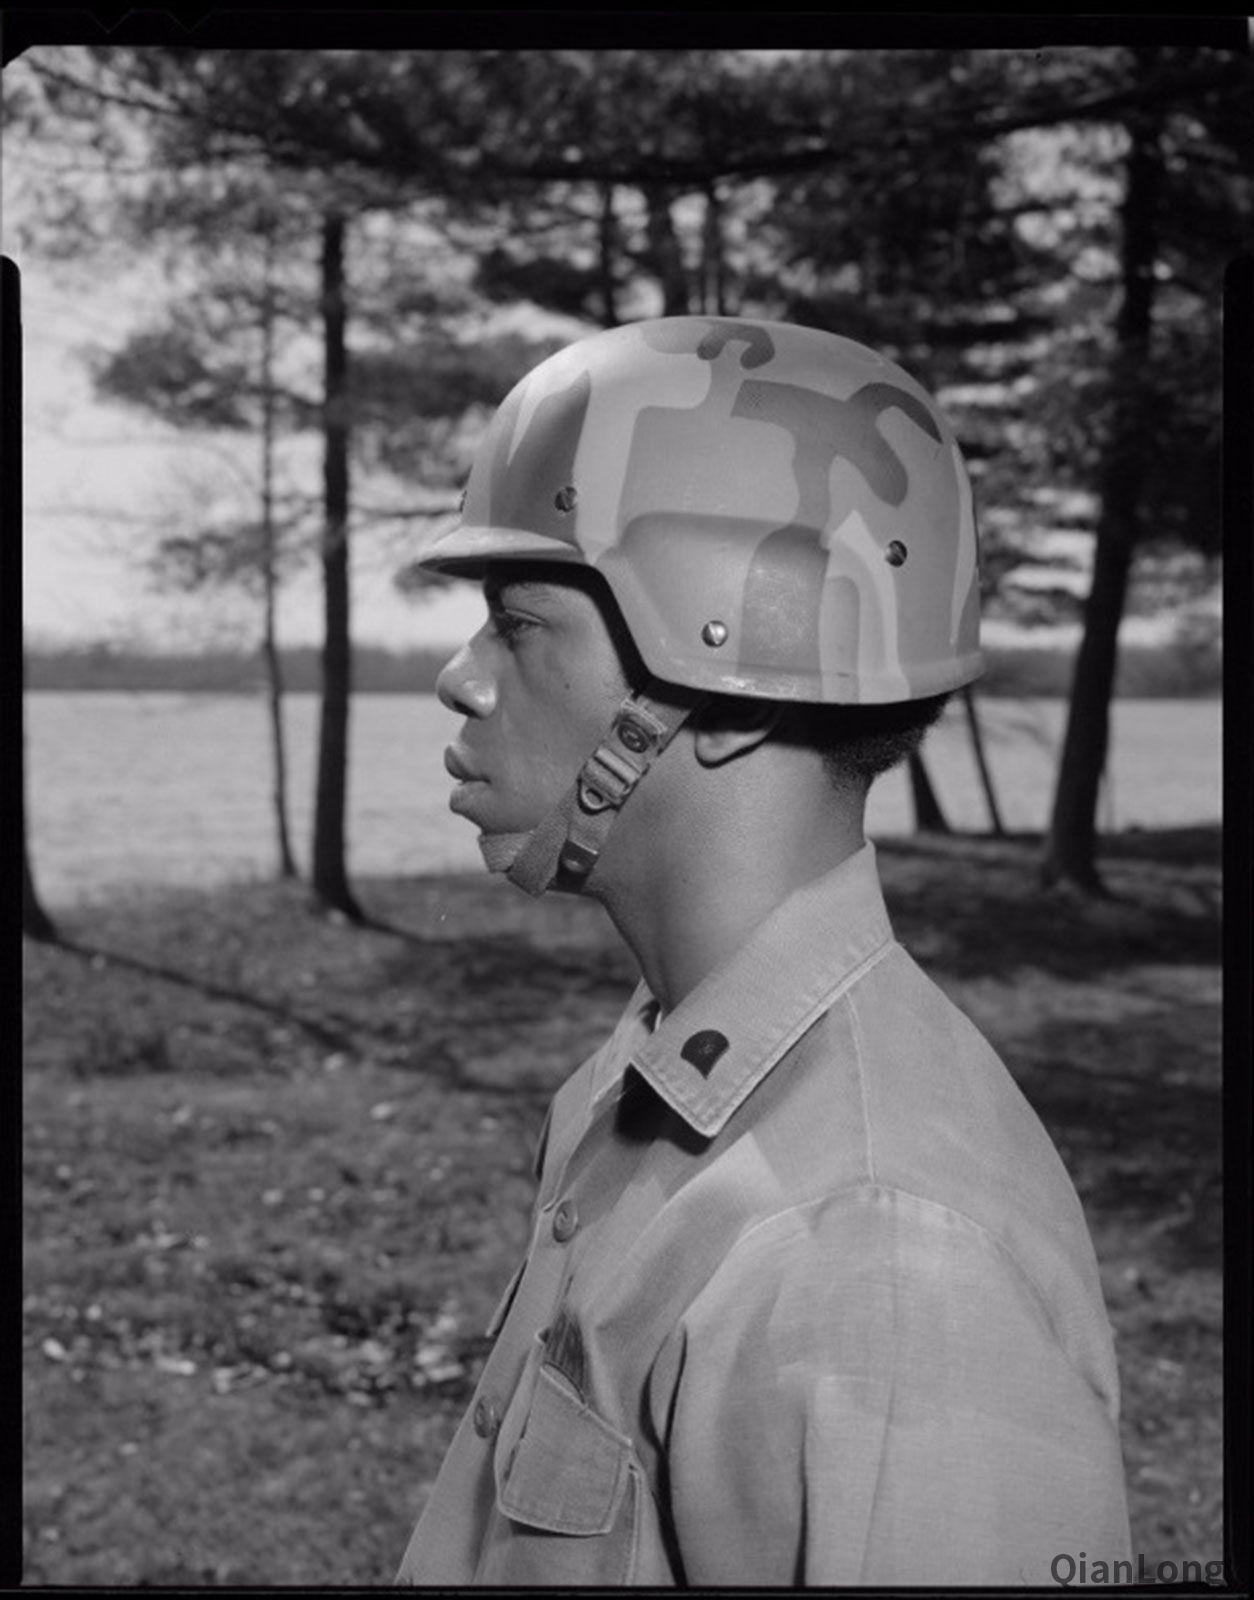 01.PASGT系統的頭盔(為了便於敘述,下文統稱為PASGT頭盔)採用了凱夫拉材料製造,能夠達到ⅢA級防彈標準。可以防禦破片和一定距離上的子彈直射,重量為1.41/1.91千克(ES碼/EL碼,ES-extra small,EL-extra large)。